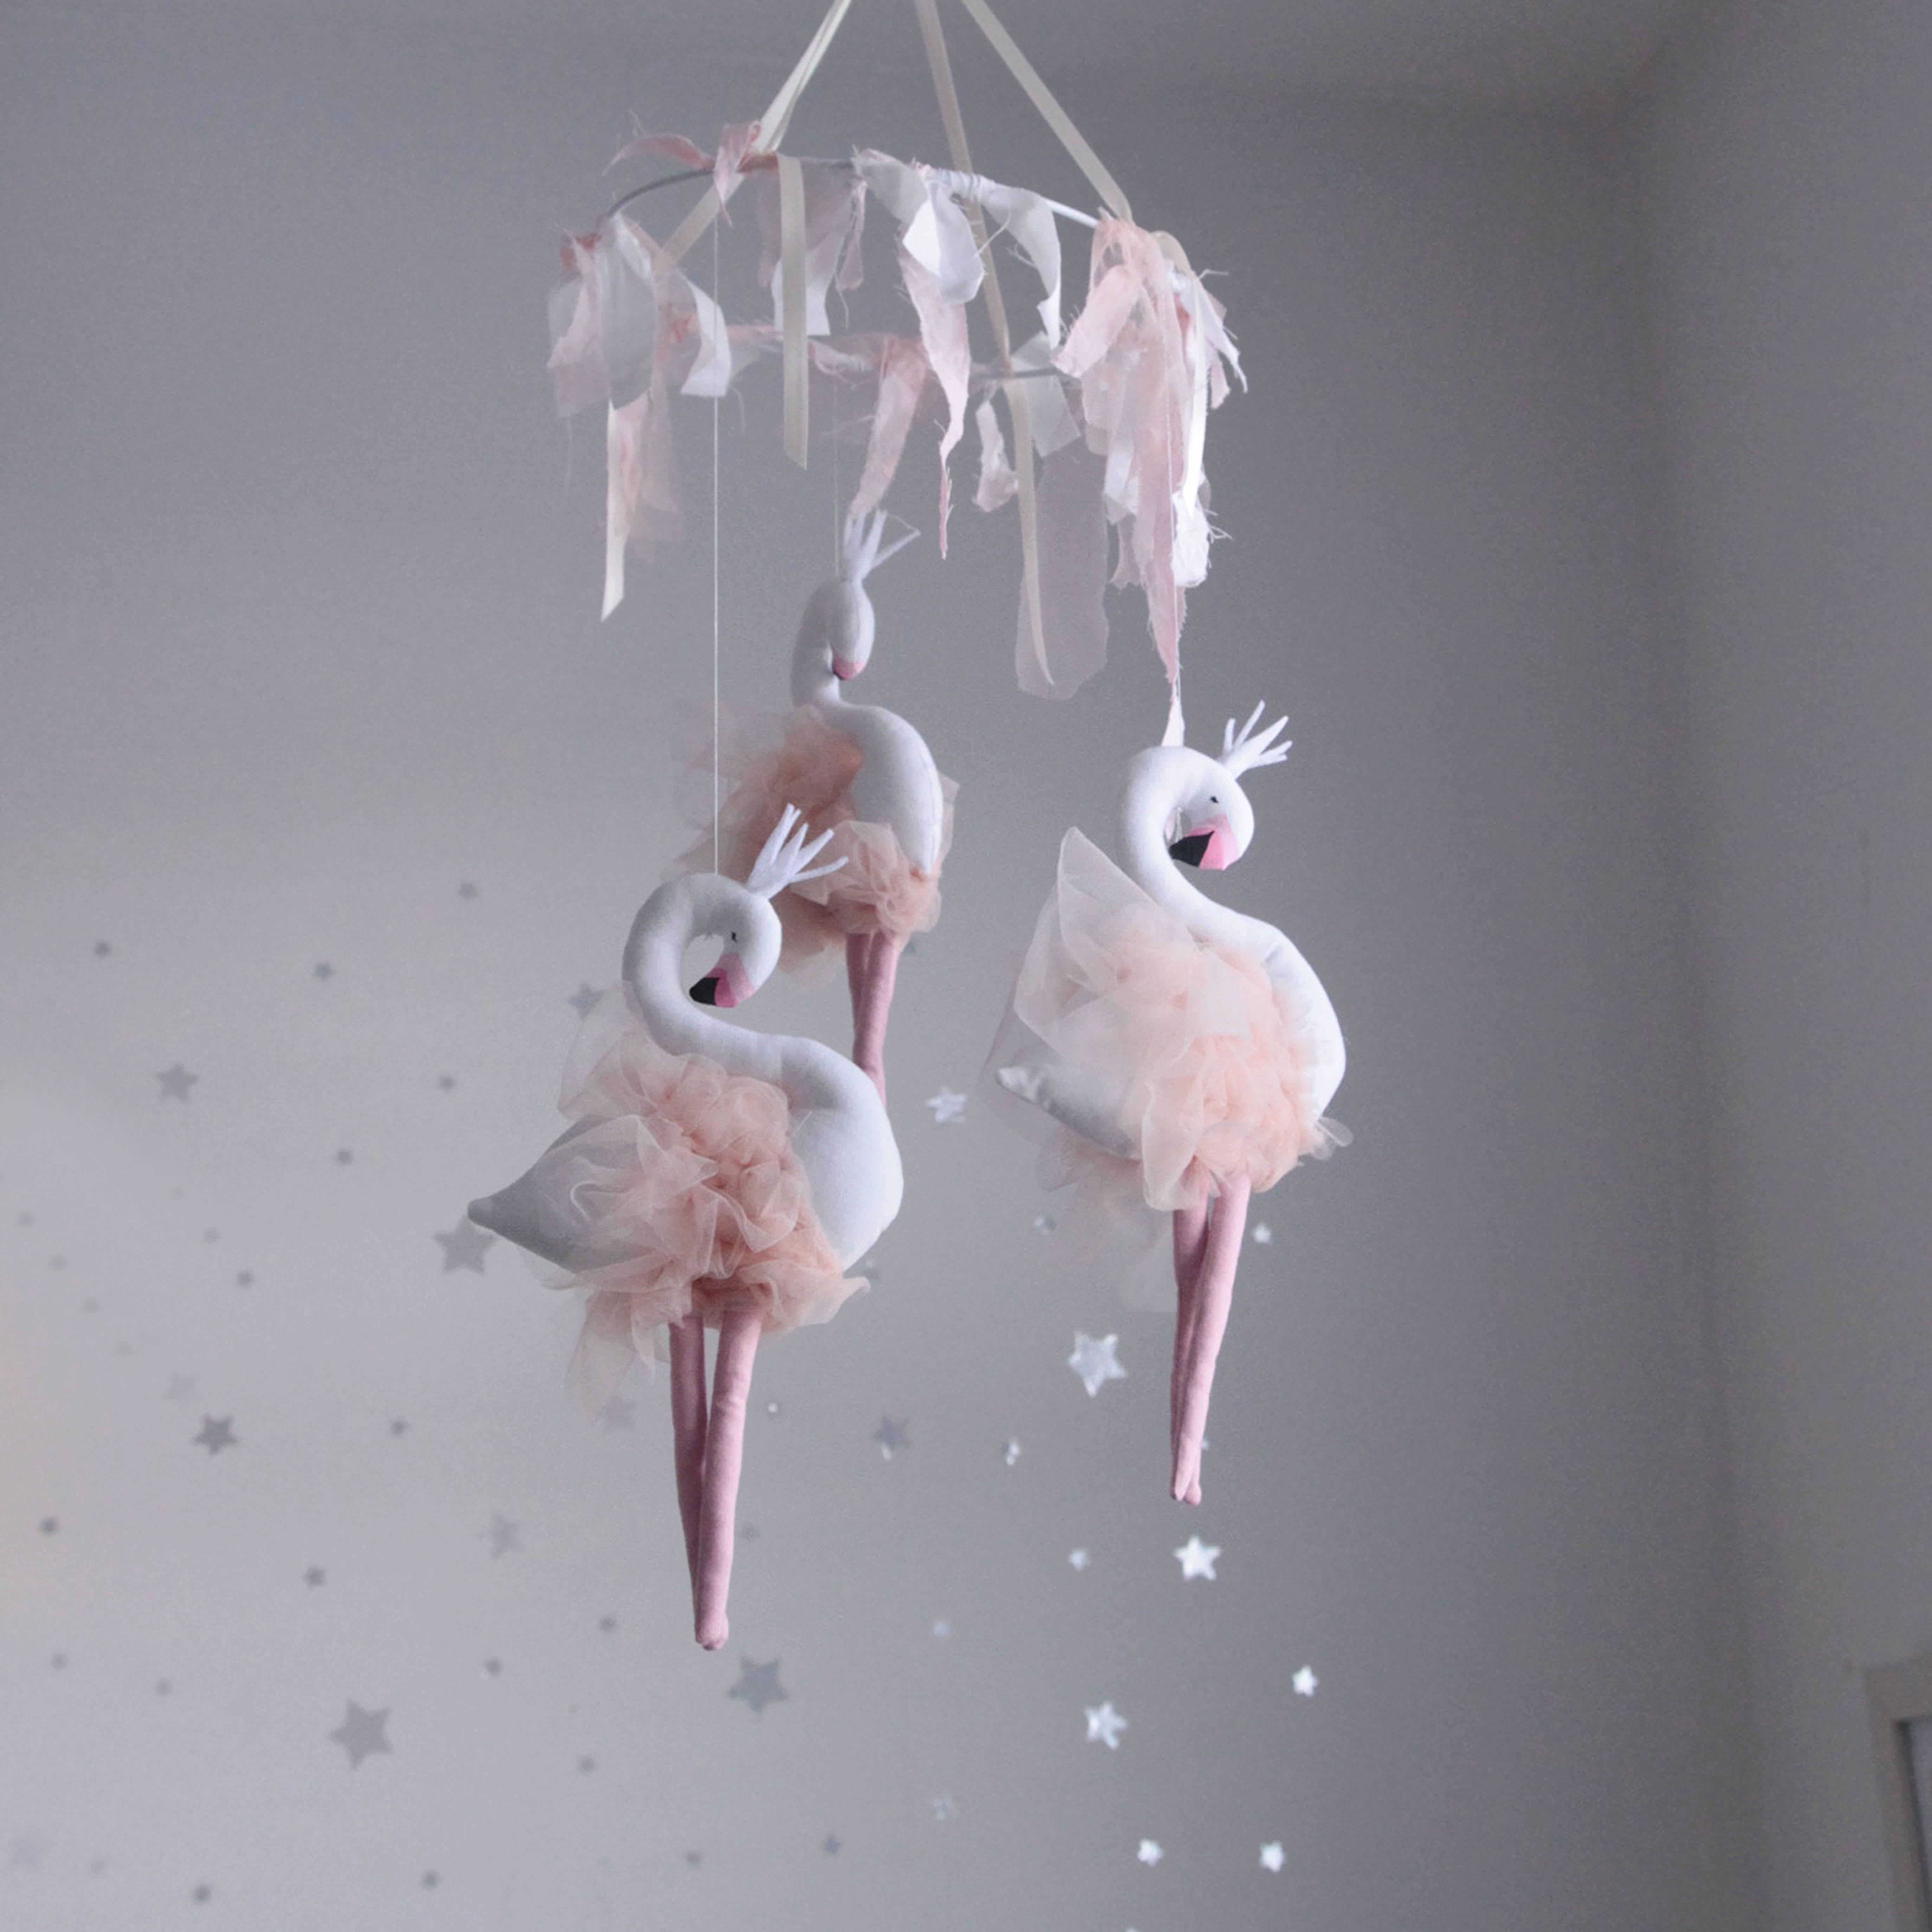 Baby flamingo car interior design - 3 Mini Liliana Flamingos Make Up This Beautiful Mobile Each Flamingo Is Stuffed By Hand